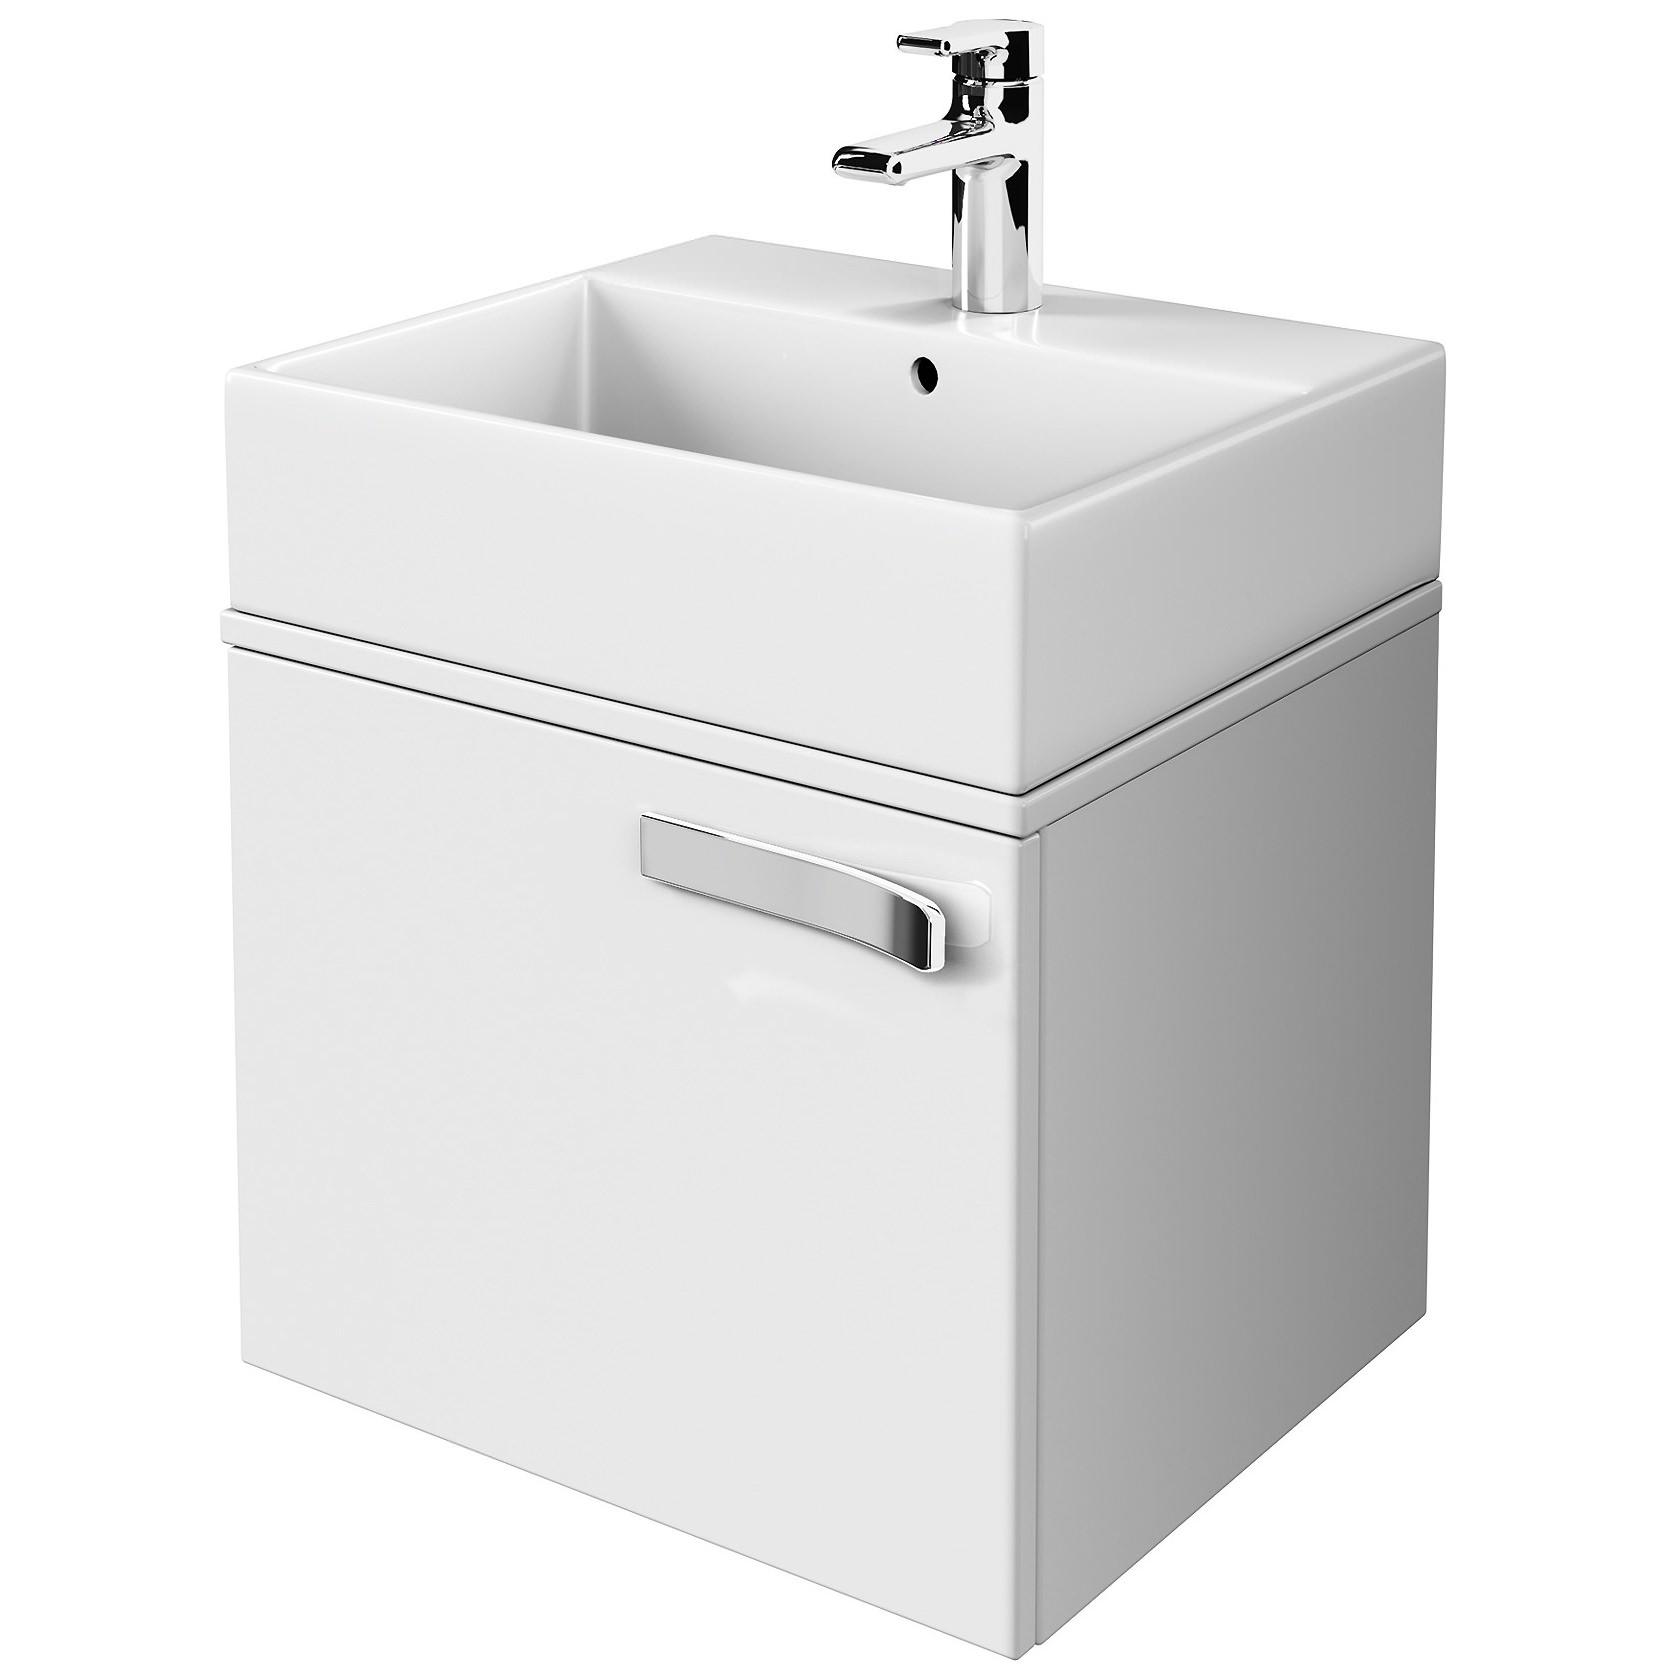 ideal standard strada gloss white 600mm basin unit with worktop. Black Bedroom Furniture Sets. Home Design Ideas